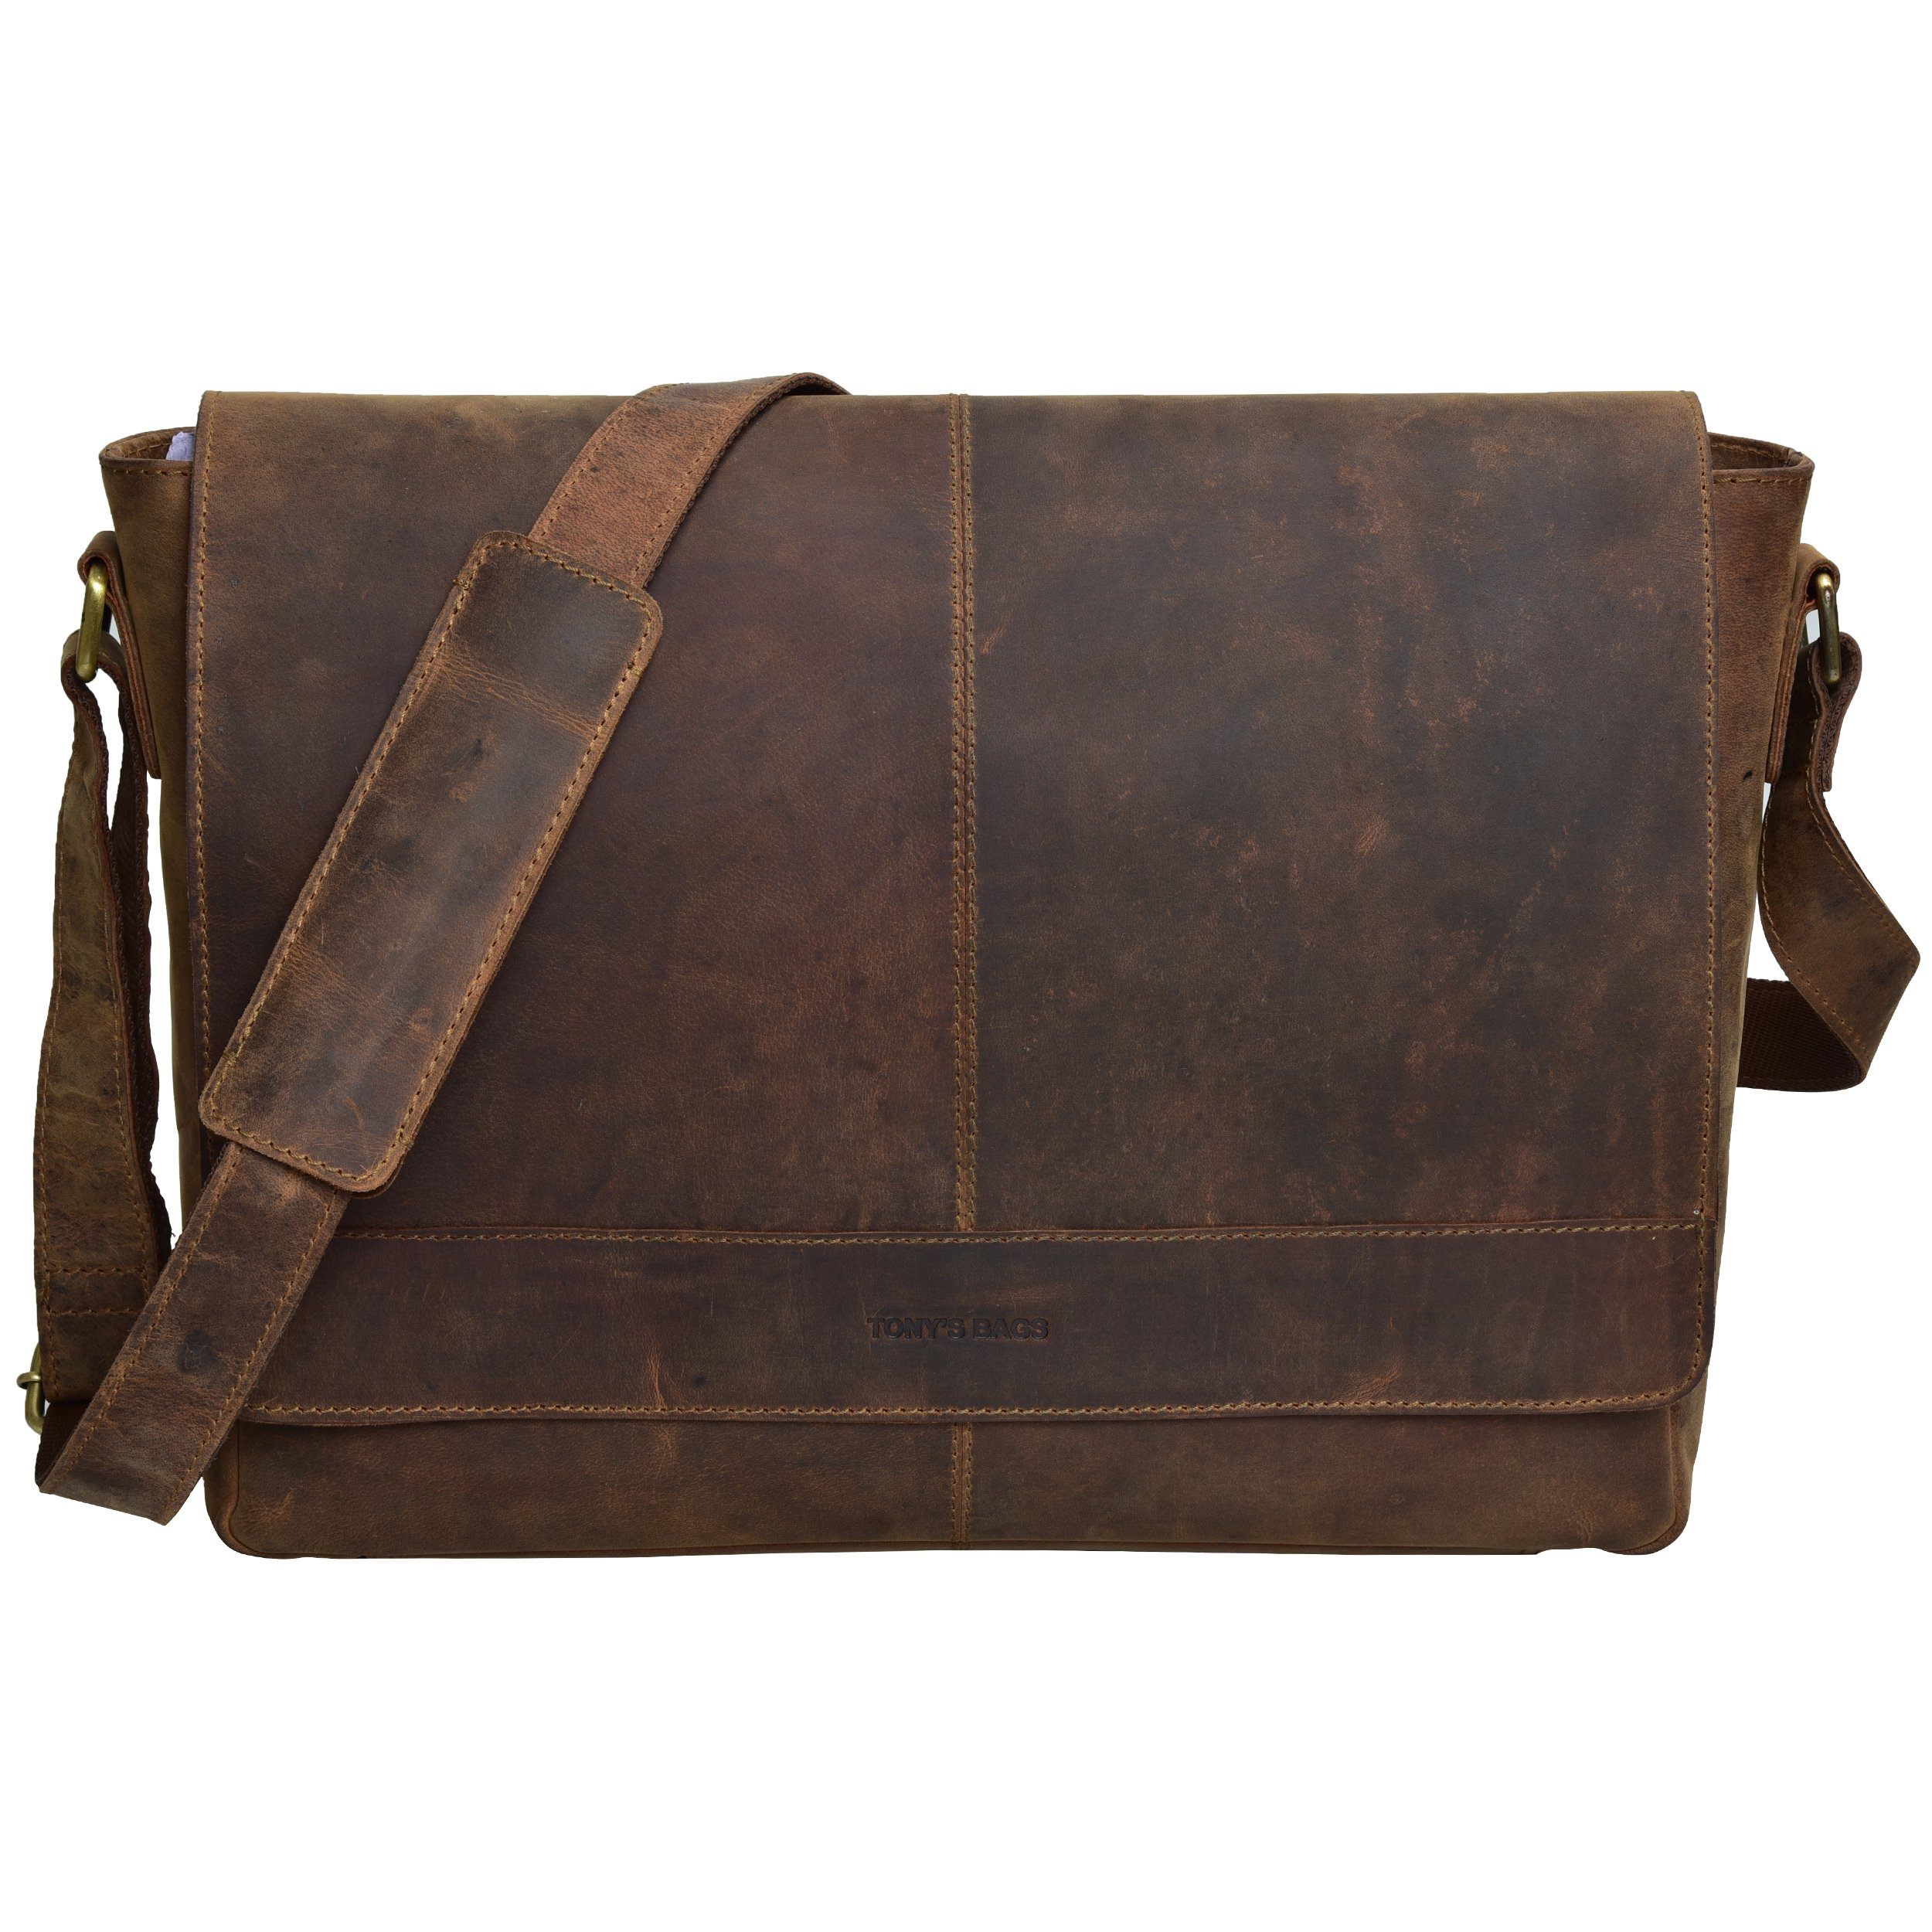 TONY'S BAGS Messenger bag, Laptop bag - College Bag, Office Bag, Business Bag Briefcase in Vintage Style